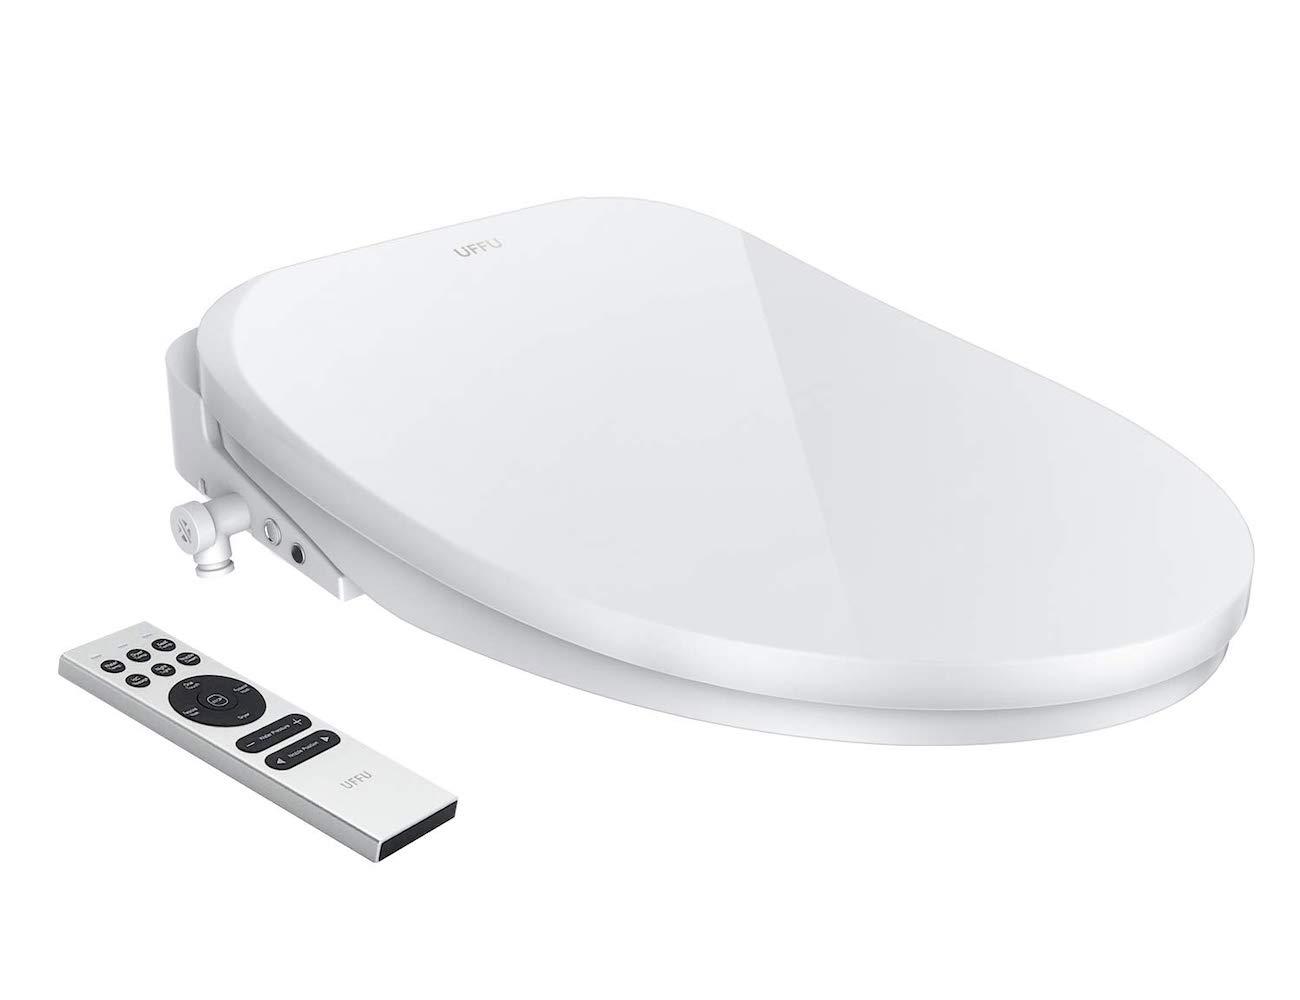 Uffu Smart Toilet Seat 187 Gadget Flow